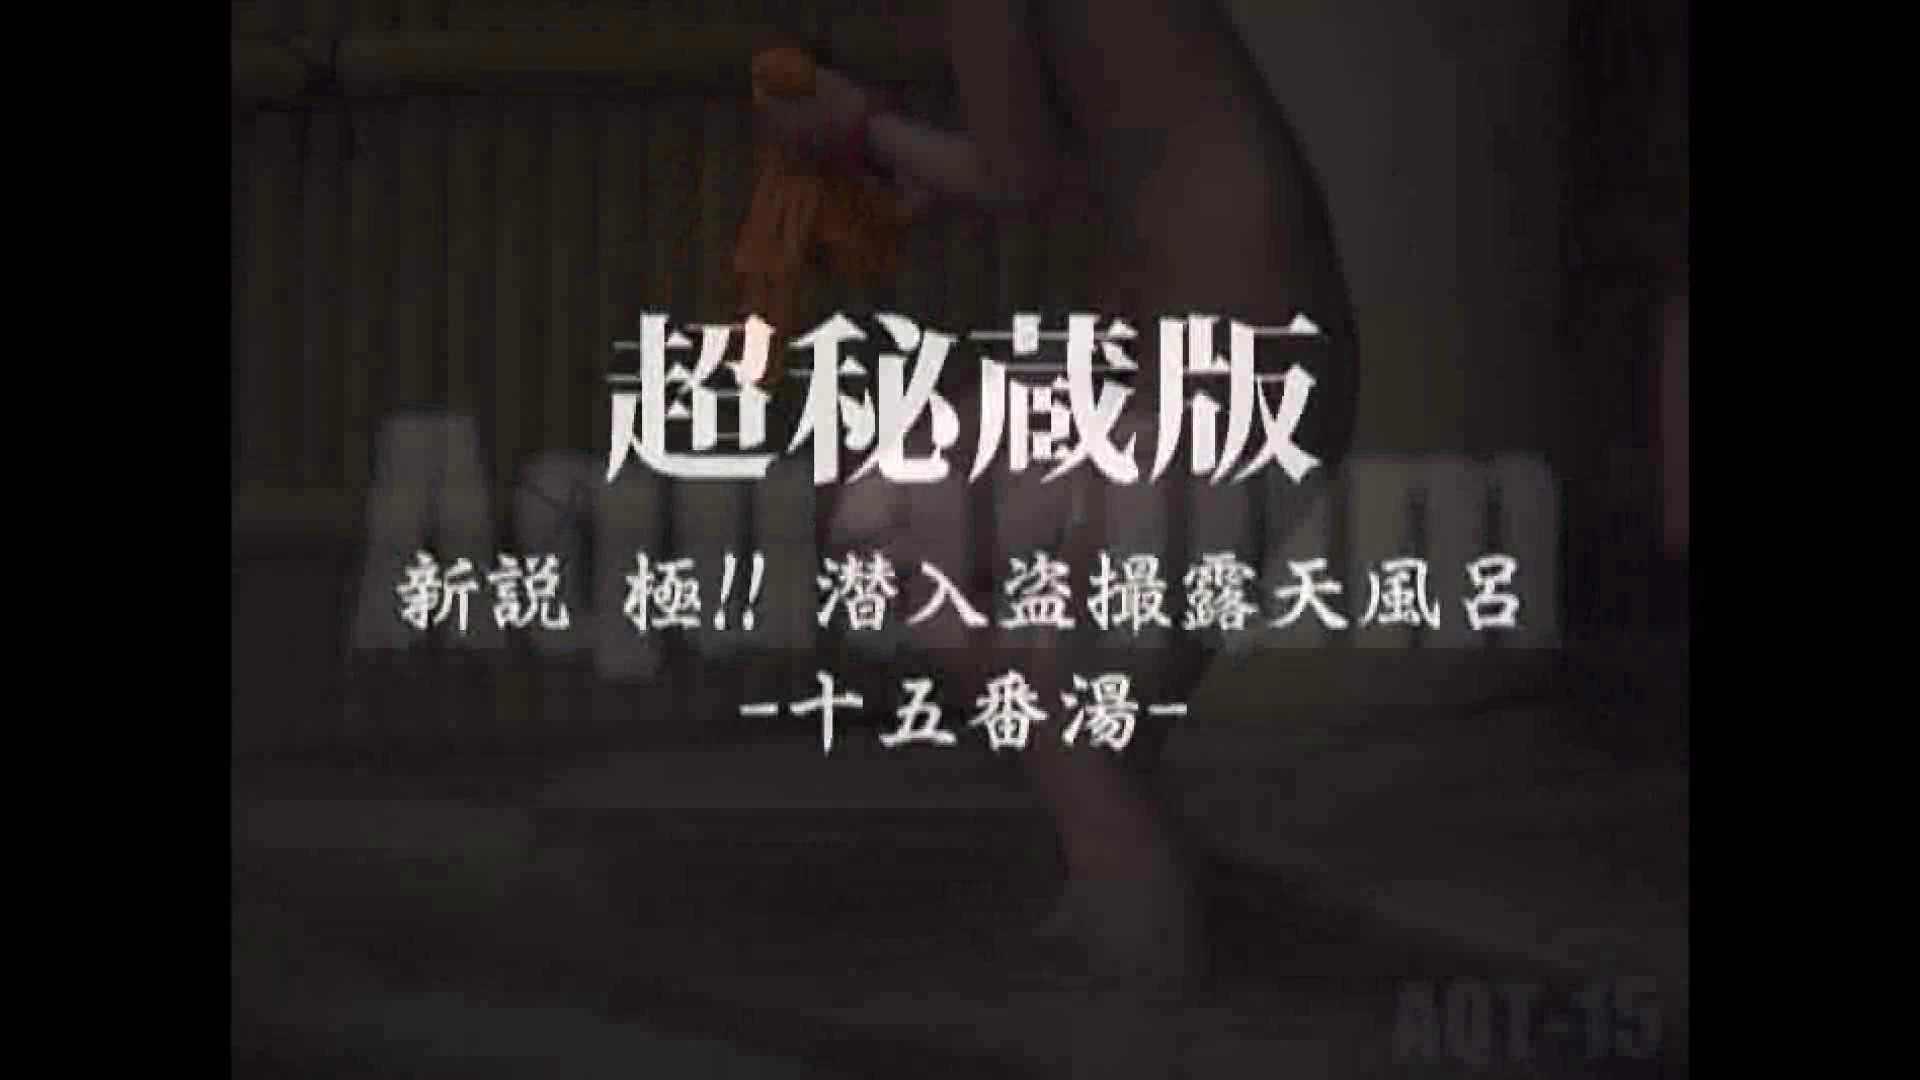 Aquaな露天風呂Vol.878潜入盗撮露天風呂十五判湯 其の八 潜入  96PIX 6